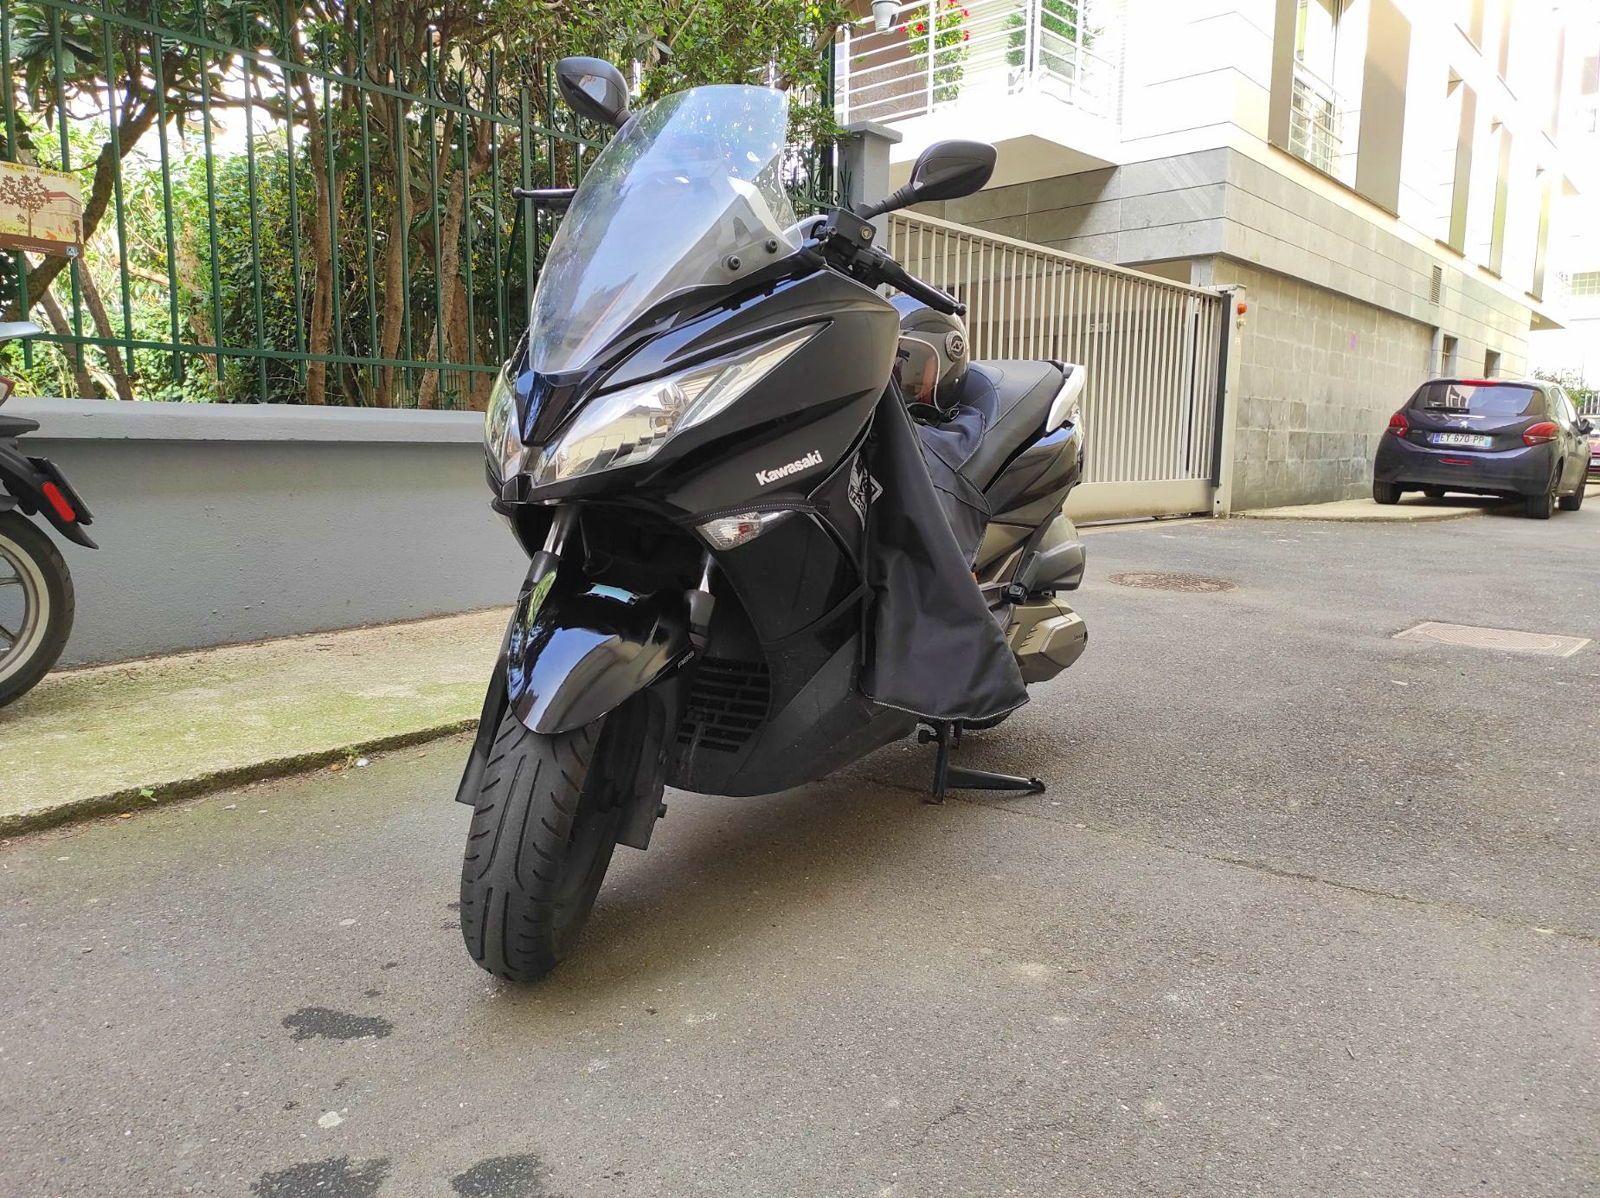 Vends Scooter Kawasaki J300ABS (300cc) 35000Km